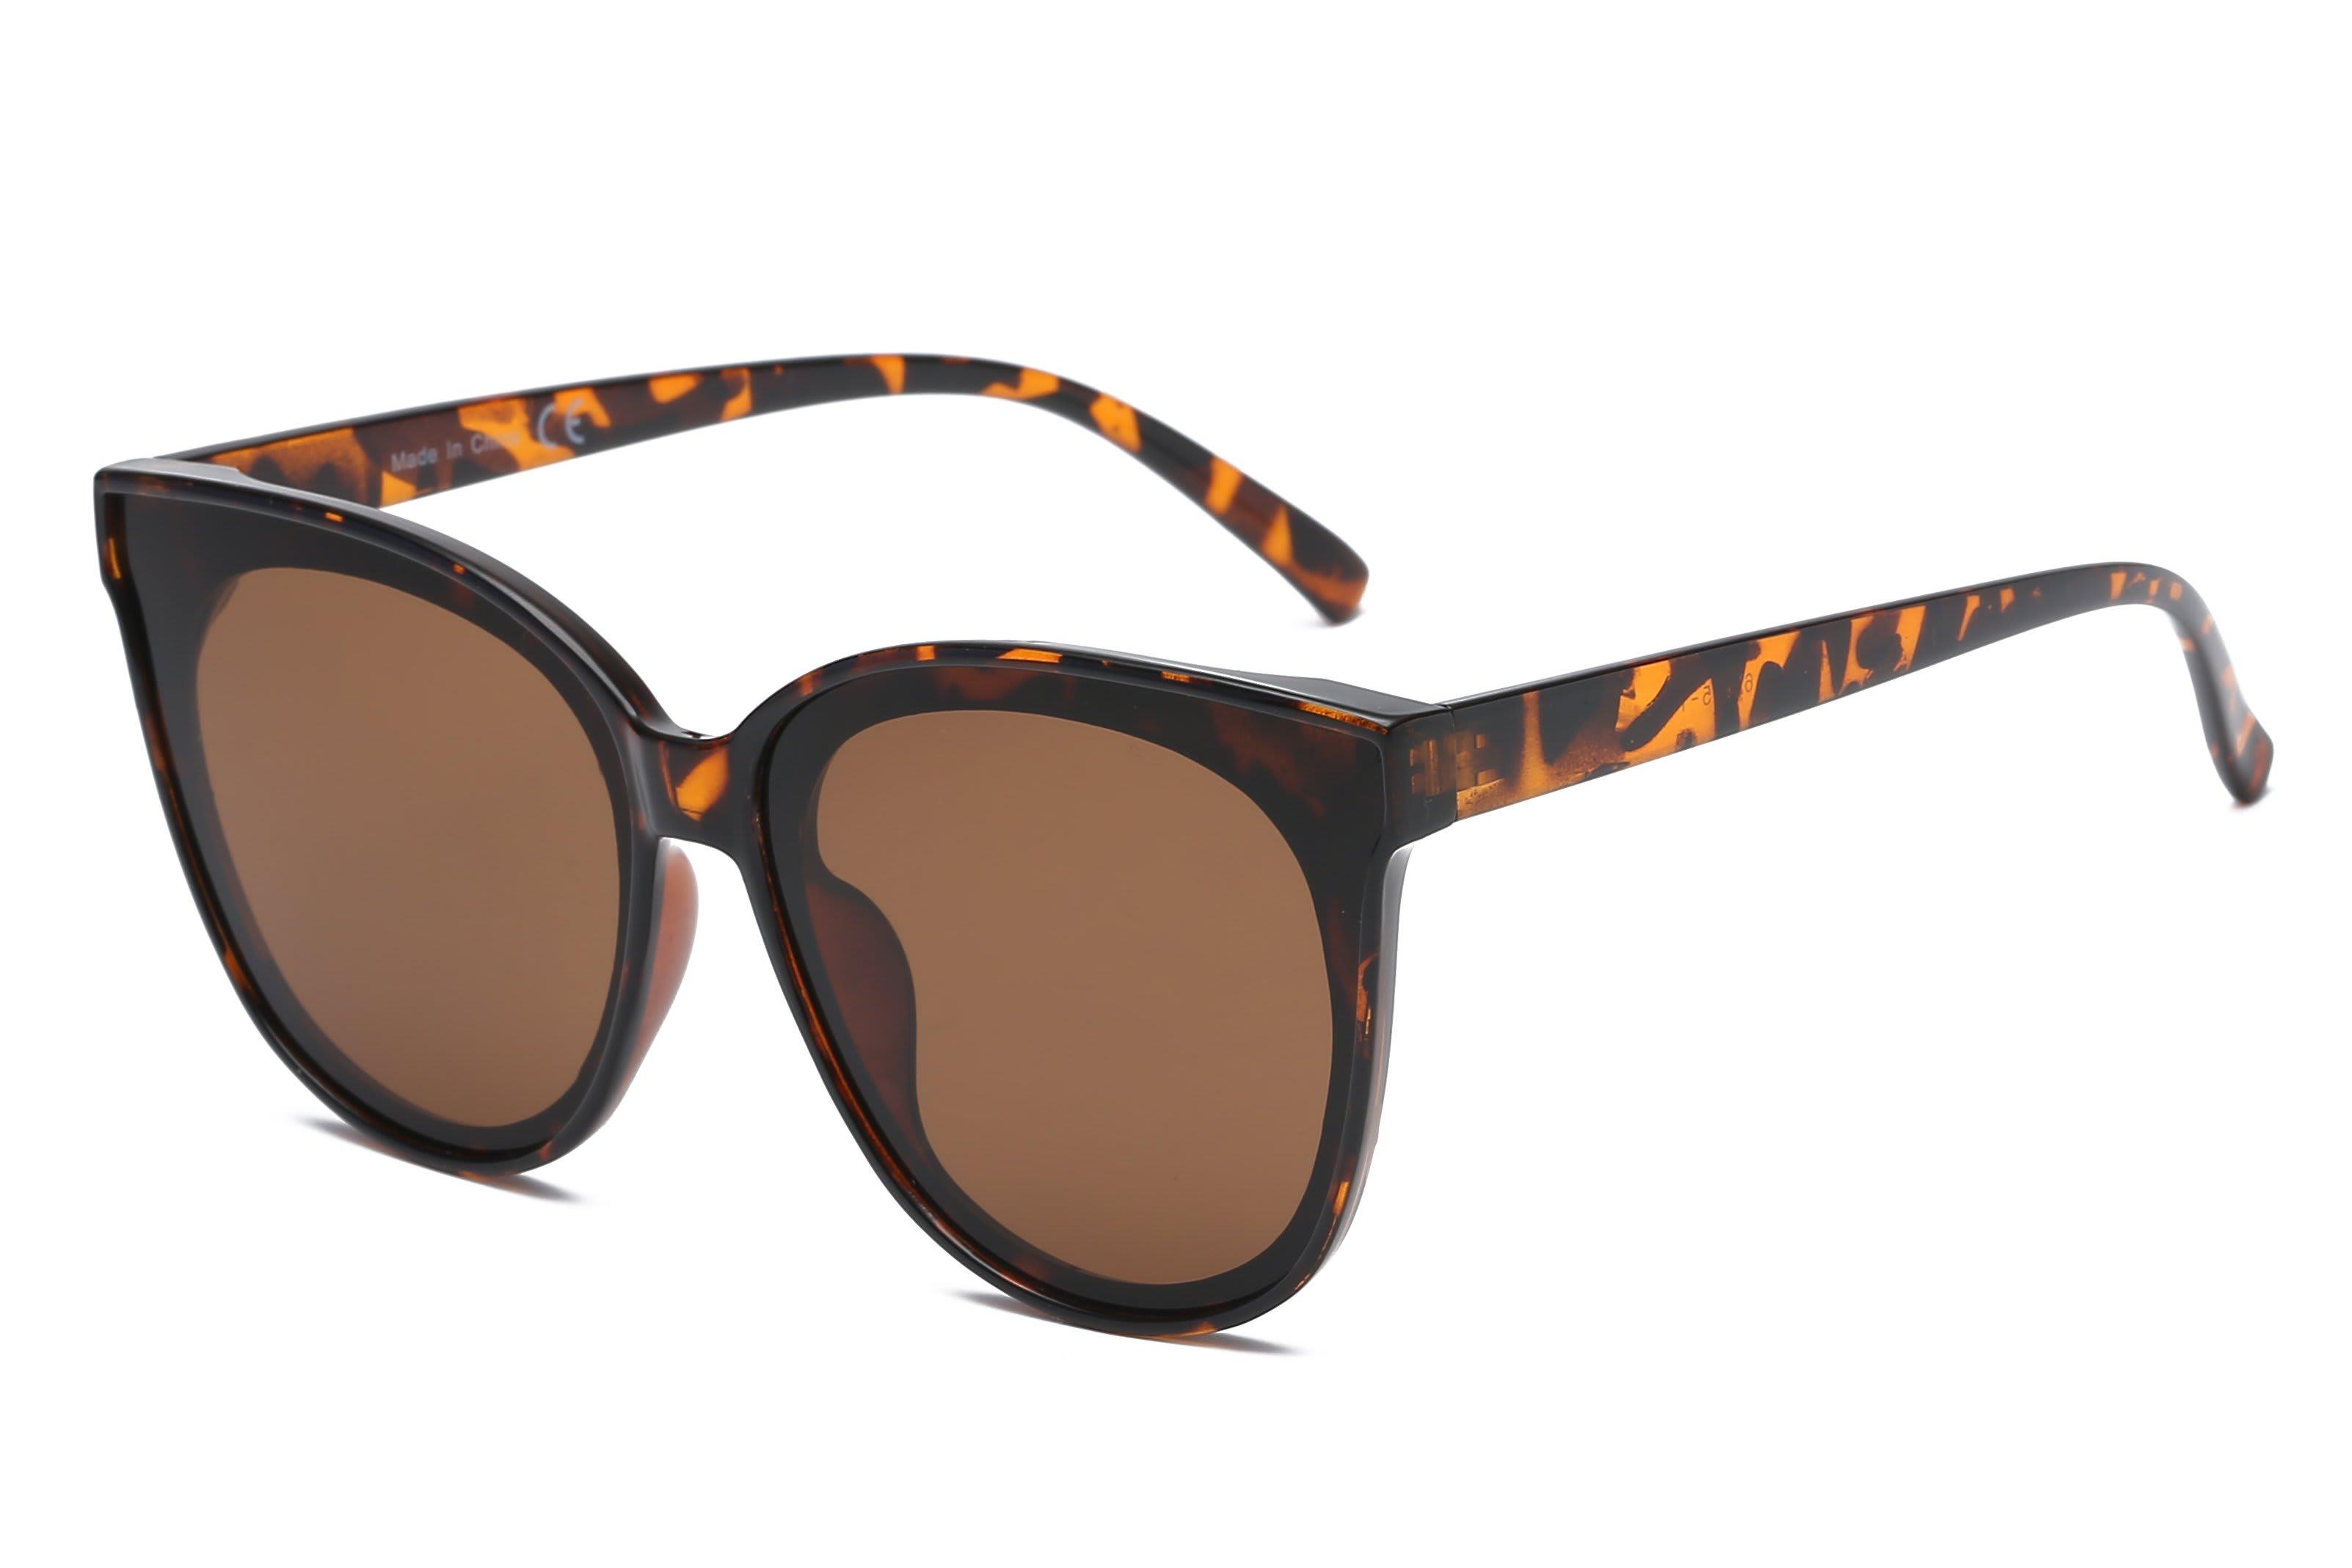 Round Cat-Eye Sunglasses - Tortoise - Front